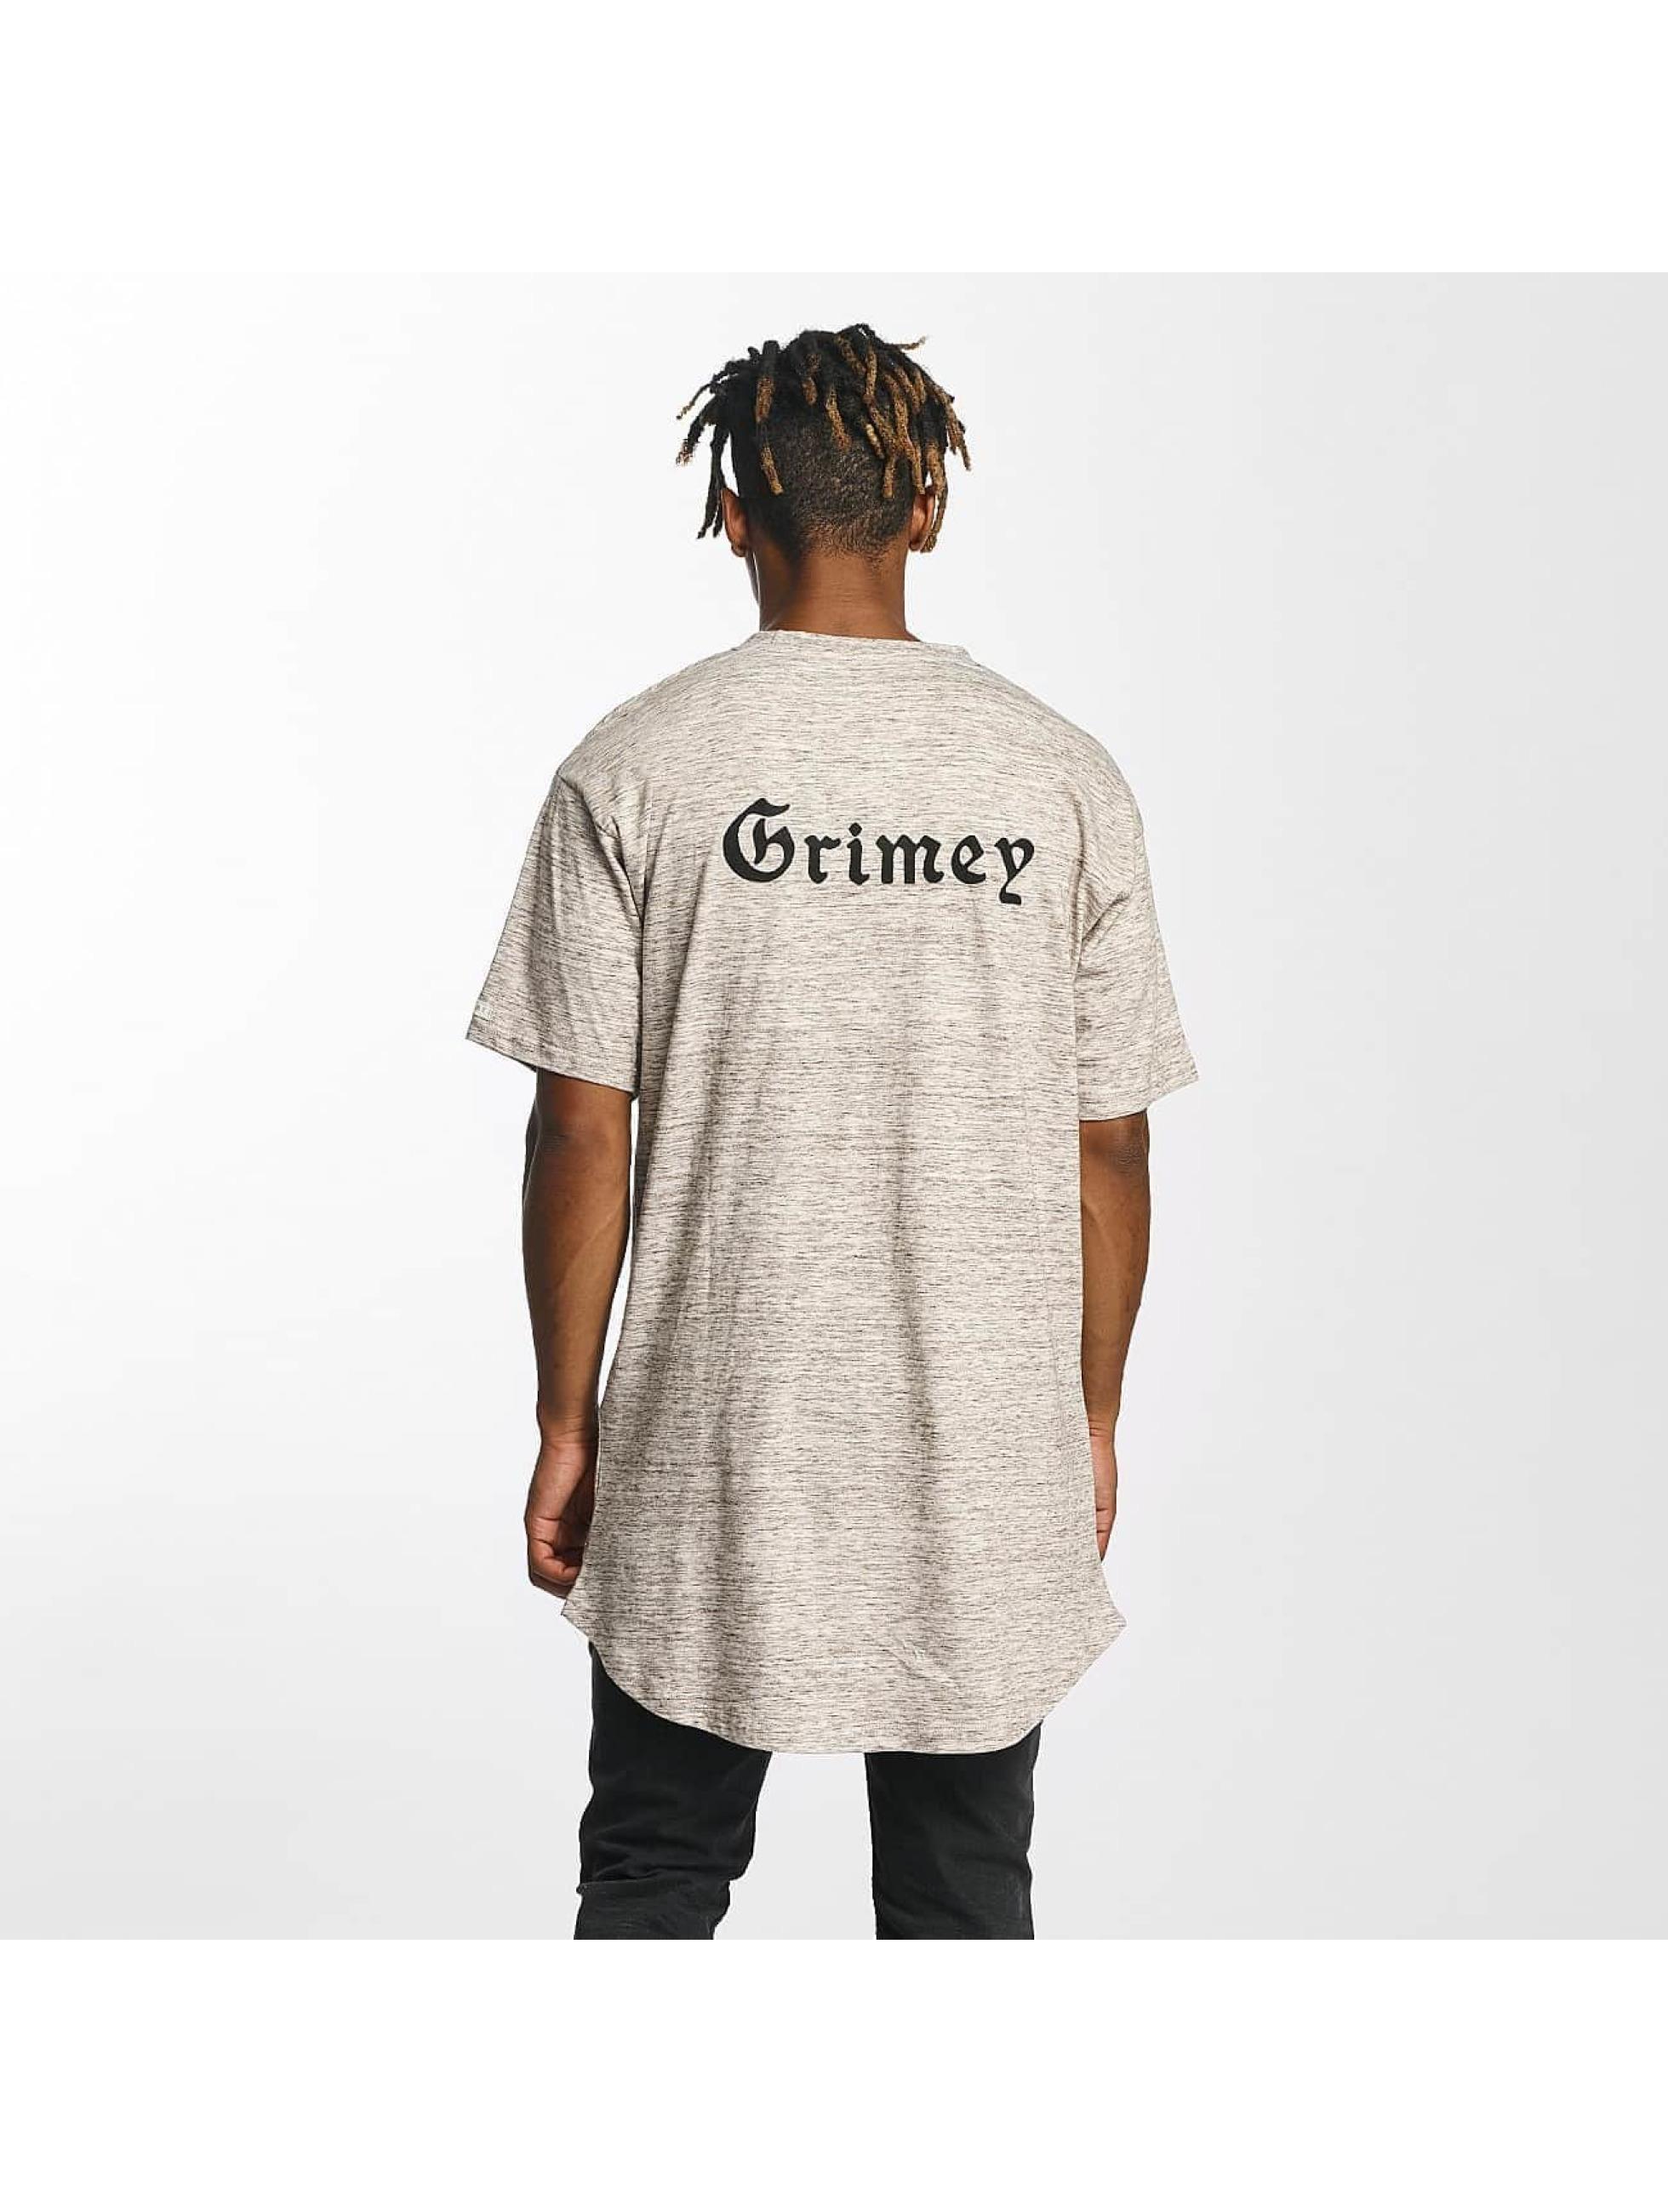 Grimey Wear Tall Tees Hi Jack Curvy Long brown